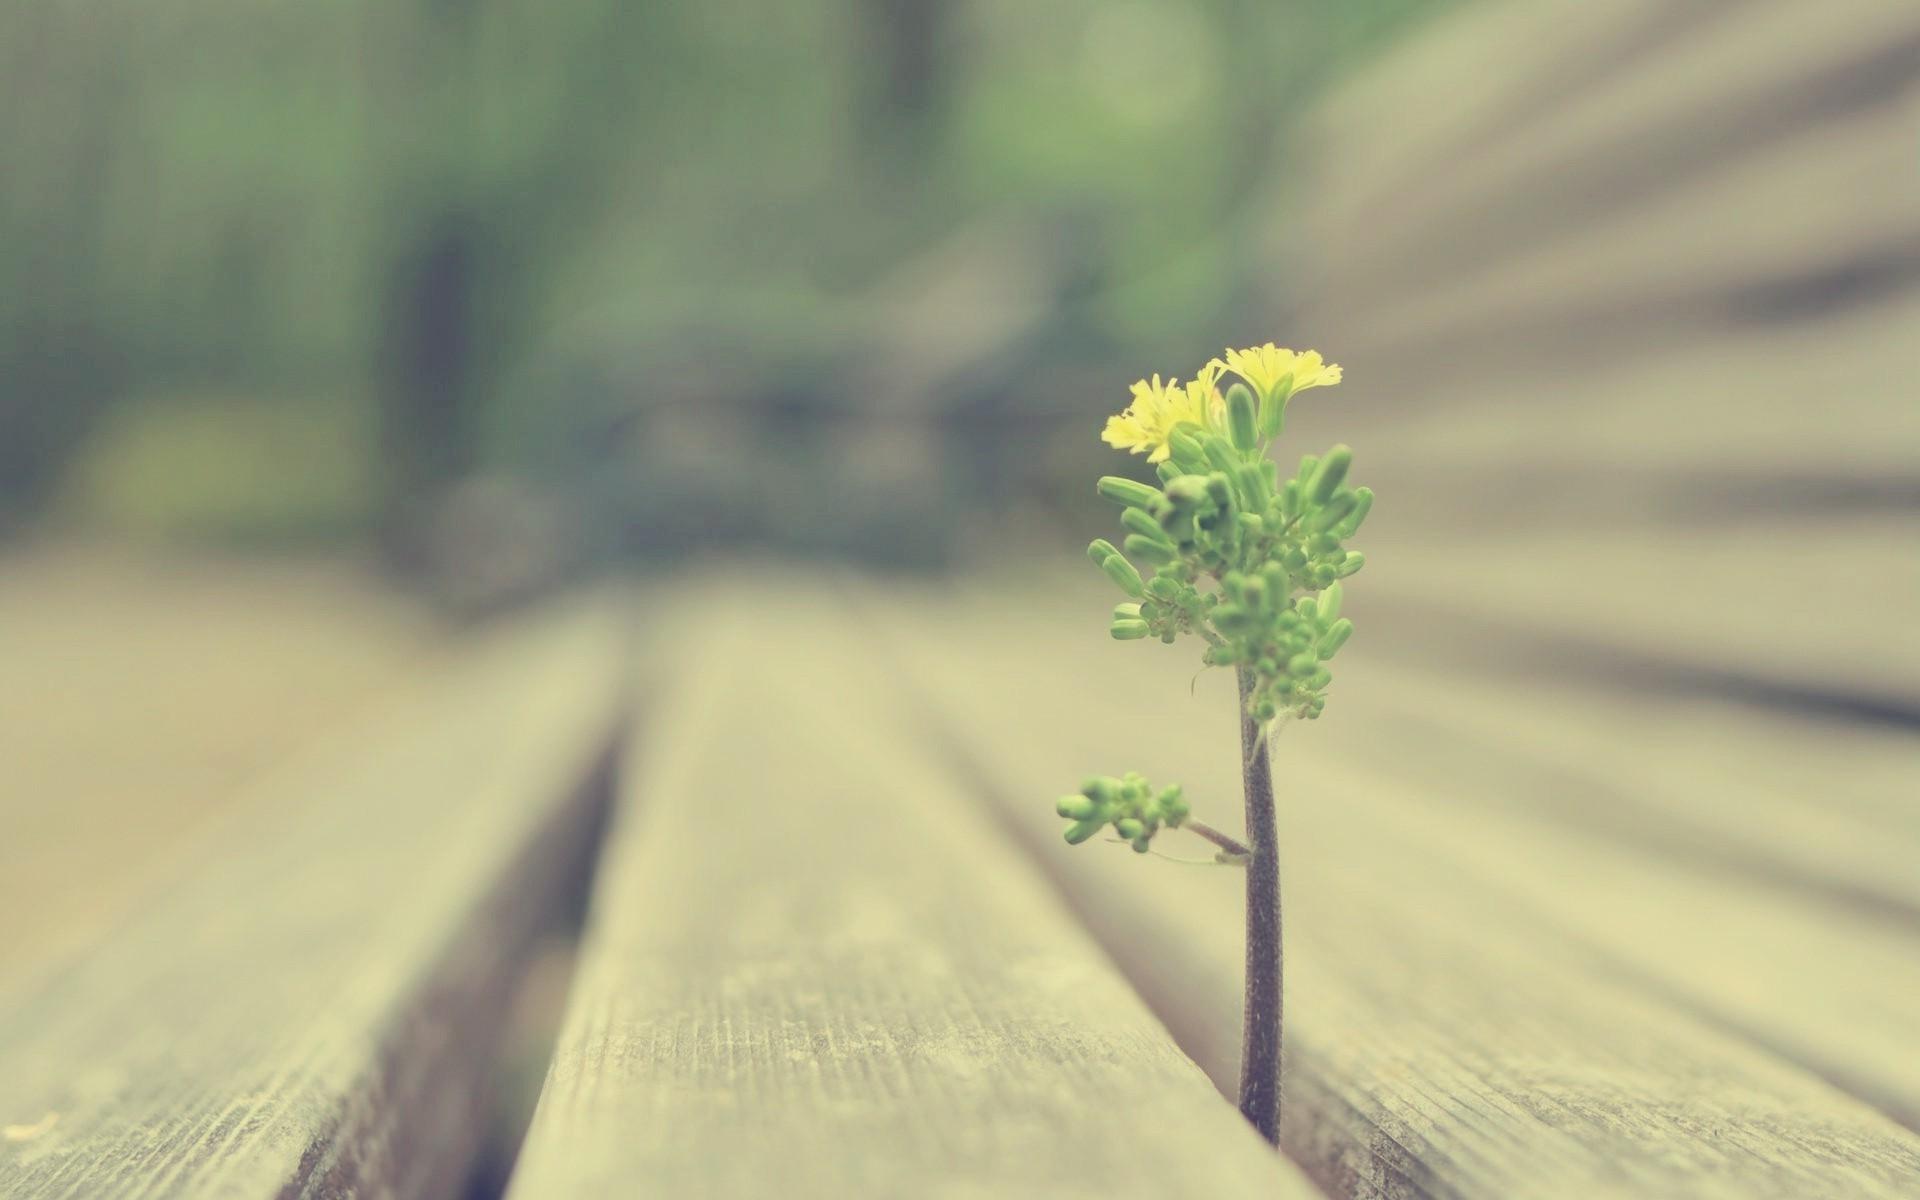 Картинки Росток, трава, дерево, растение фото и обои на рабочий стол